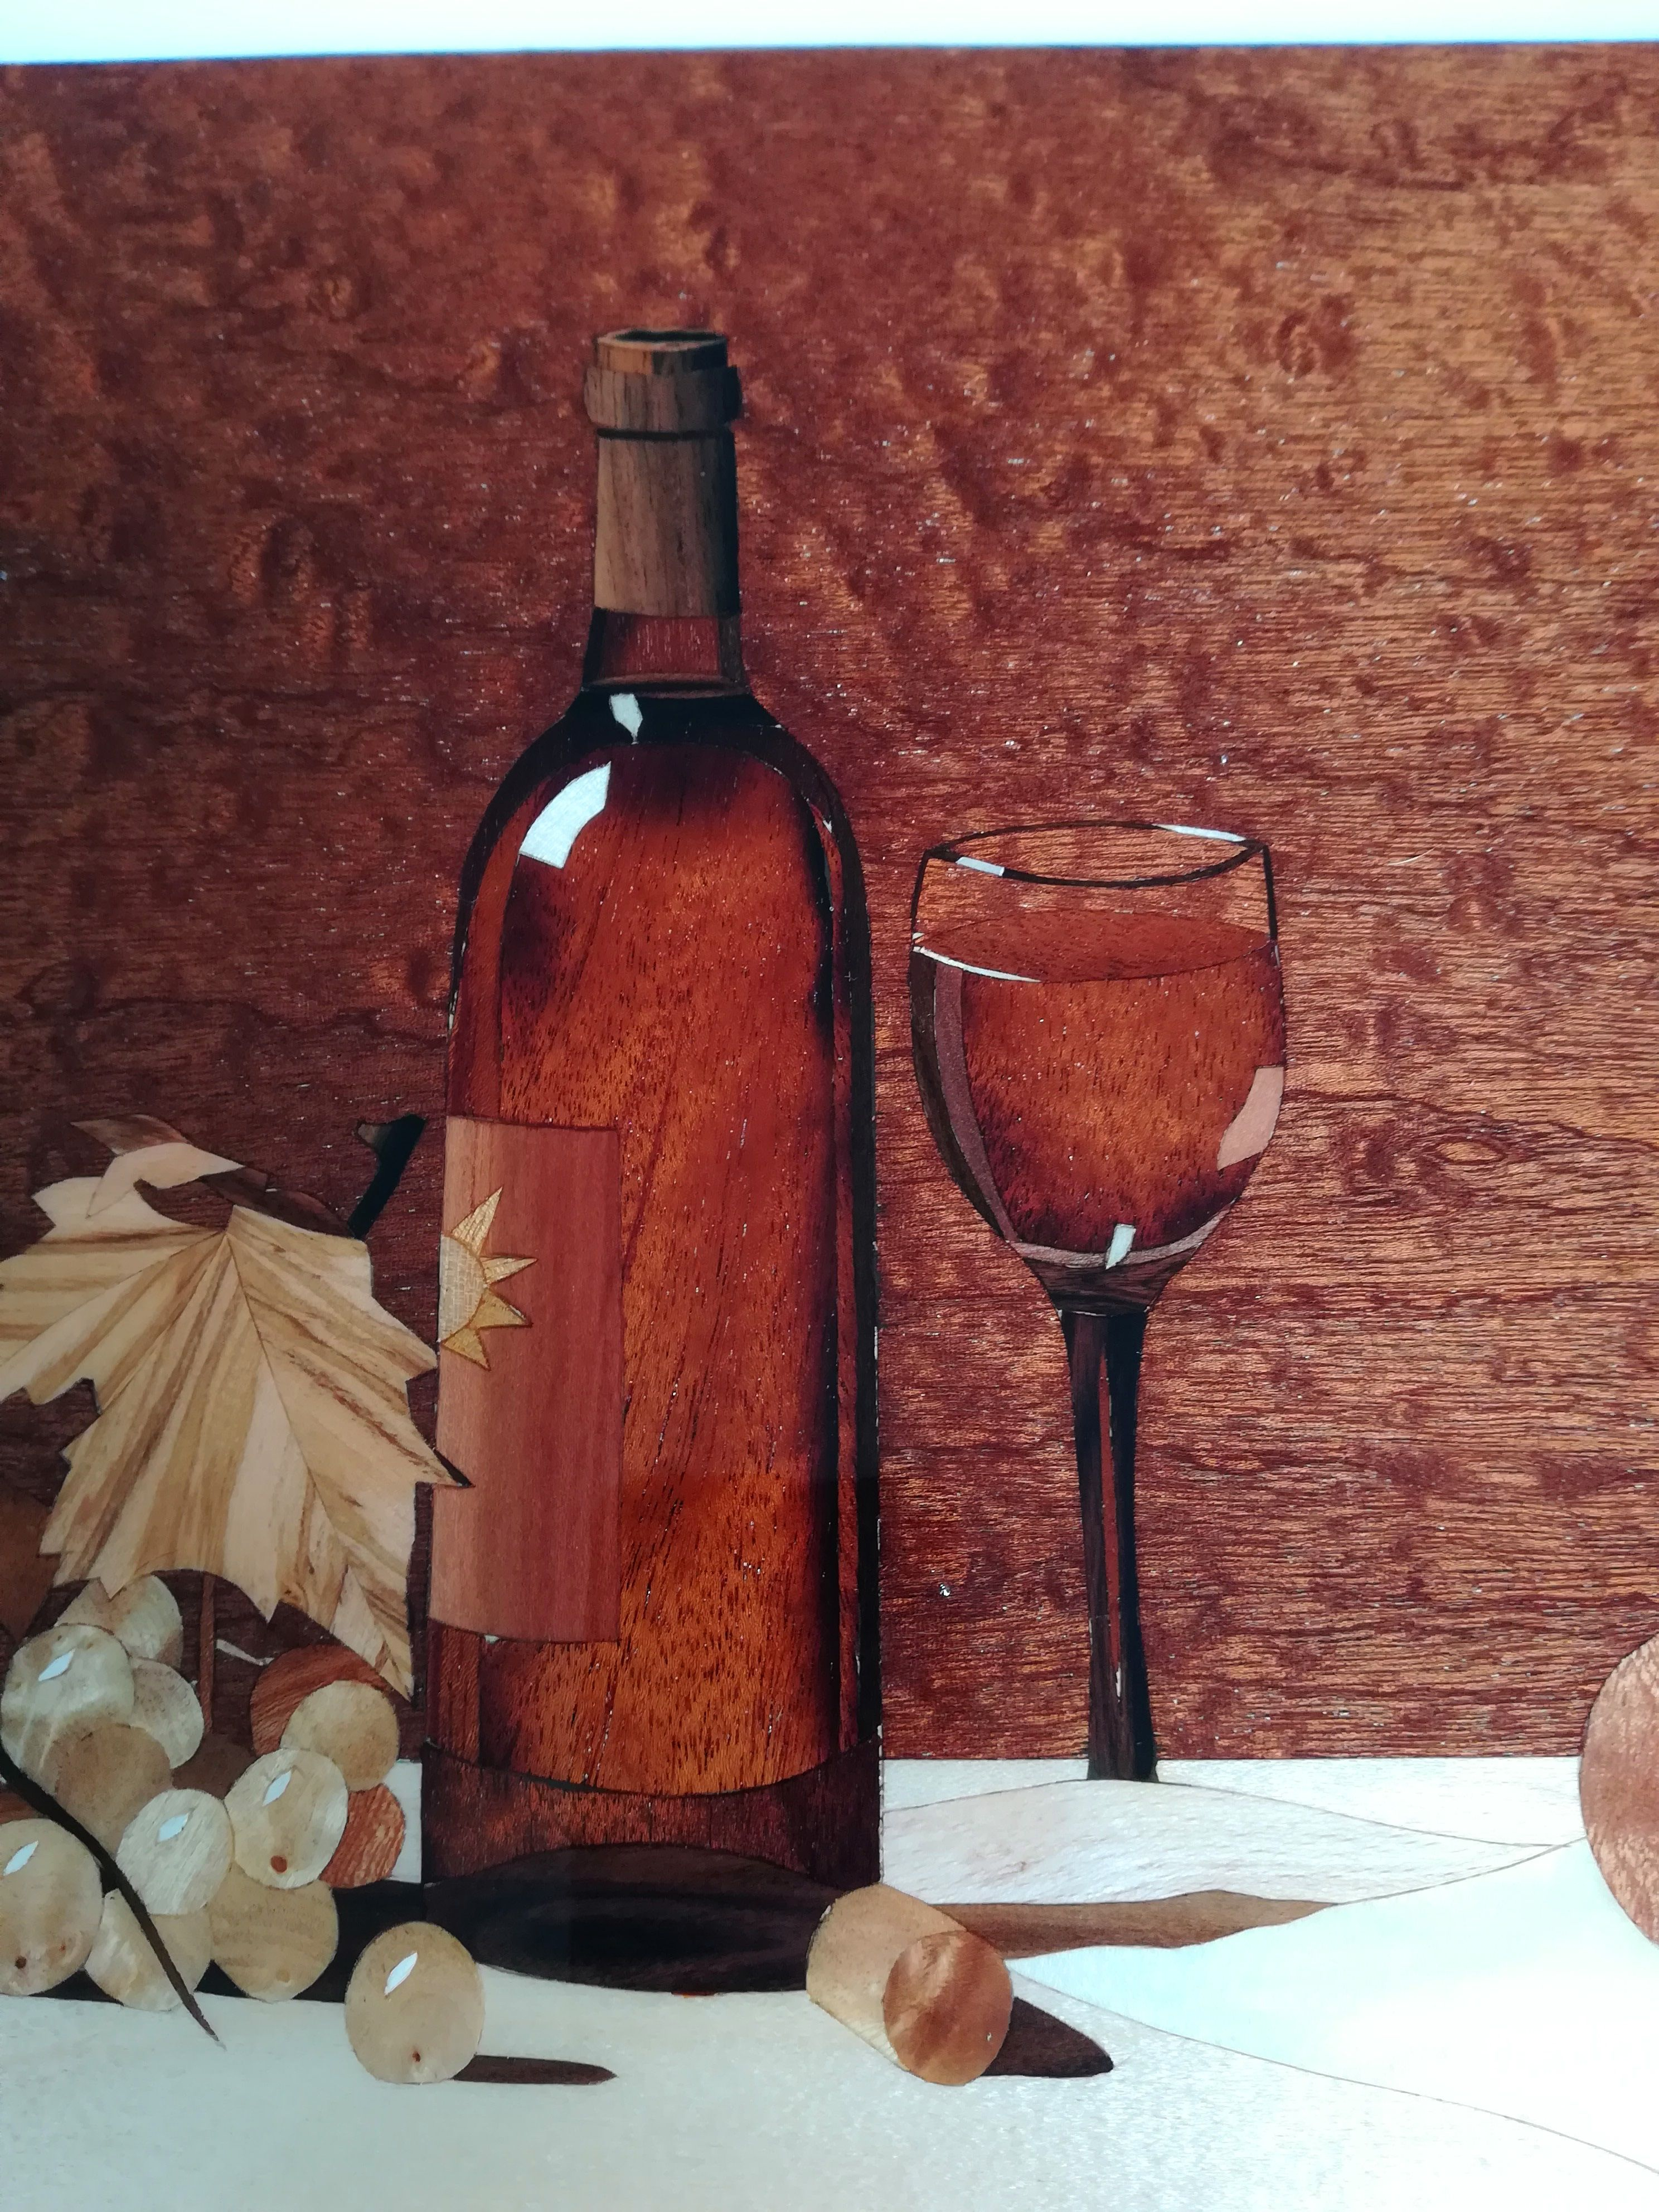 Quadro Intarsio Iperrealismo 100 Legni Naturali Pannello Etsy White Wine Wood Inlay Wood